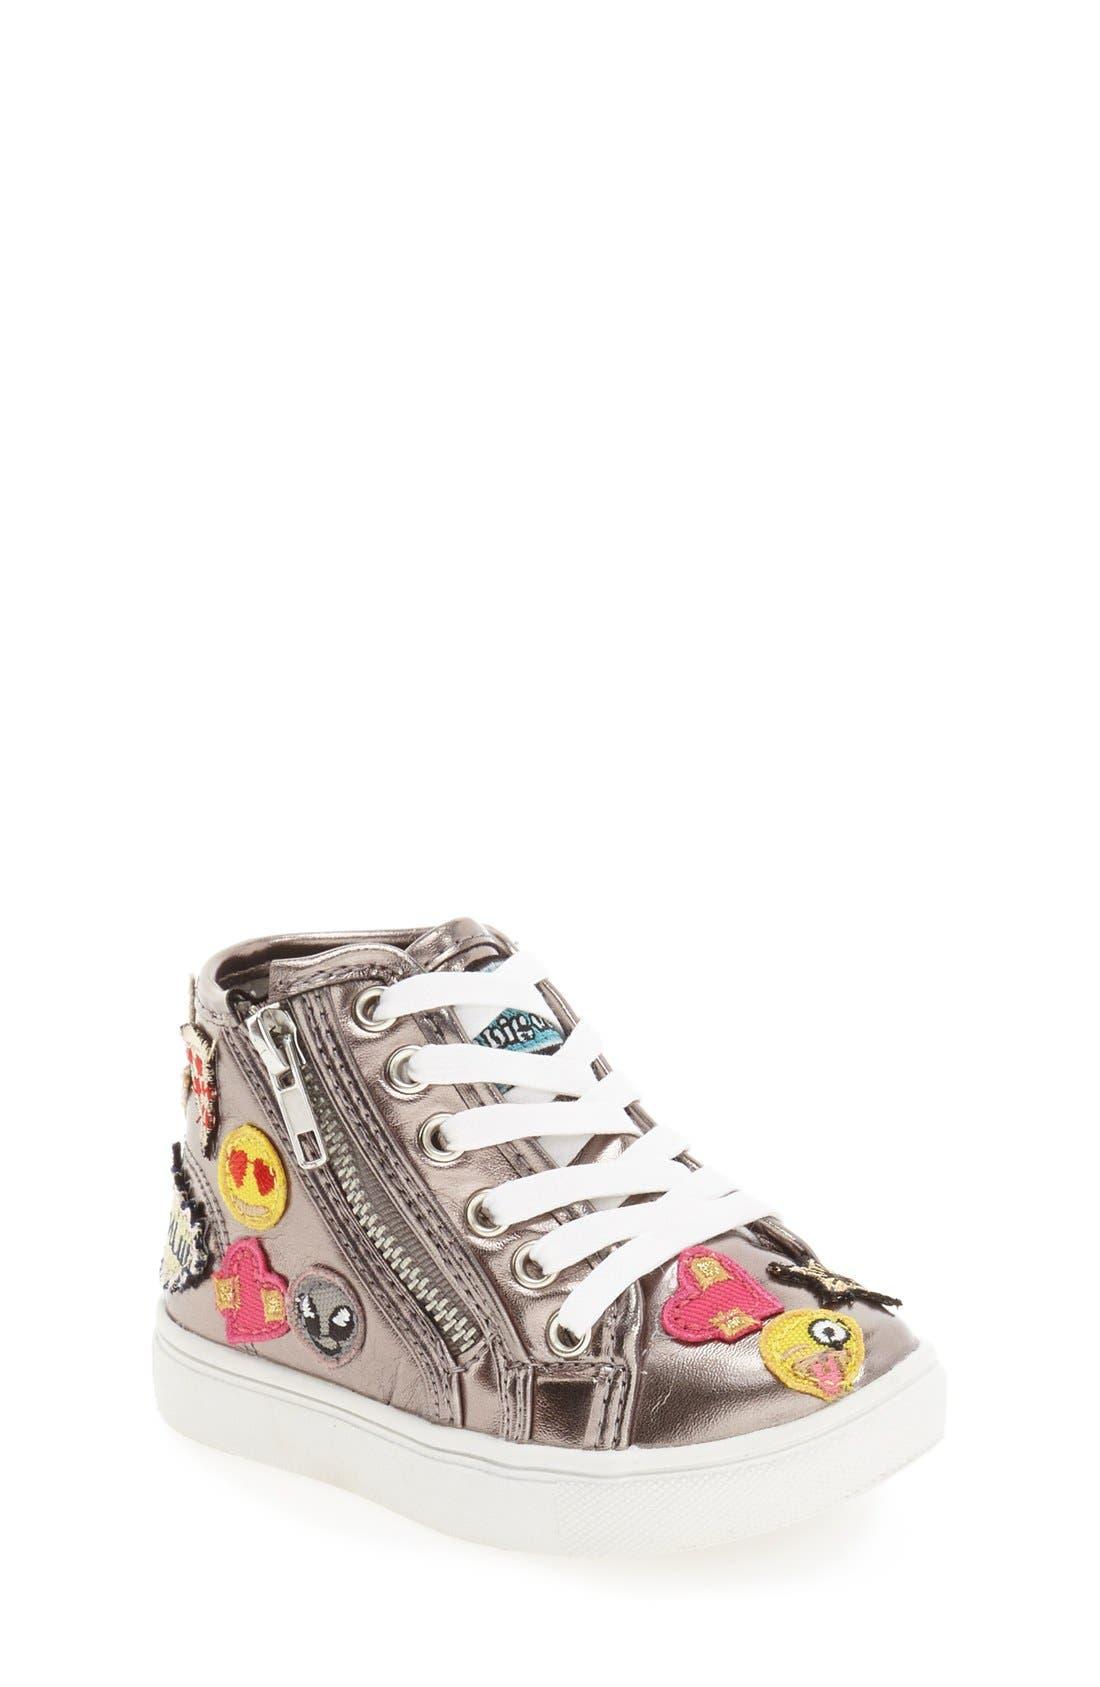 STEVE MADDEN 'Tcobrah' Emoji High Top Sneaker